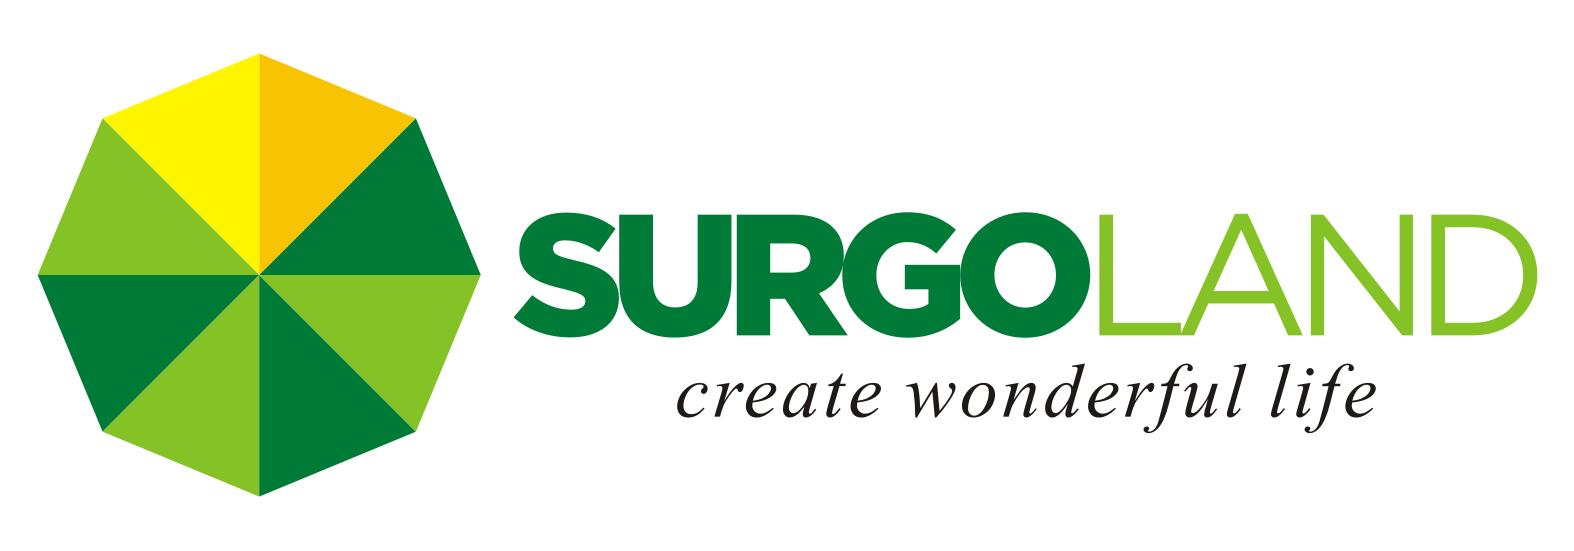 Logo Surgoland PNG